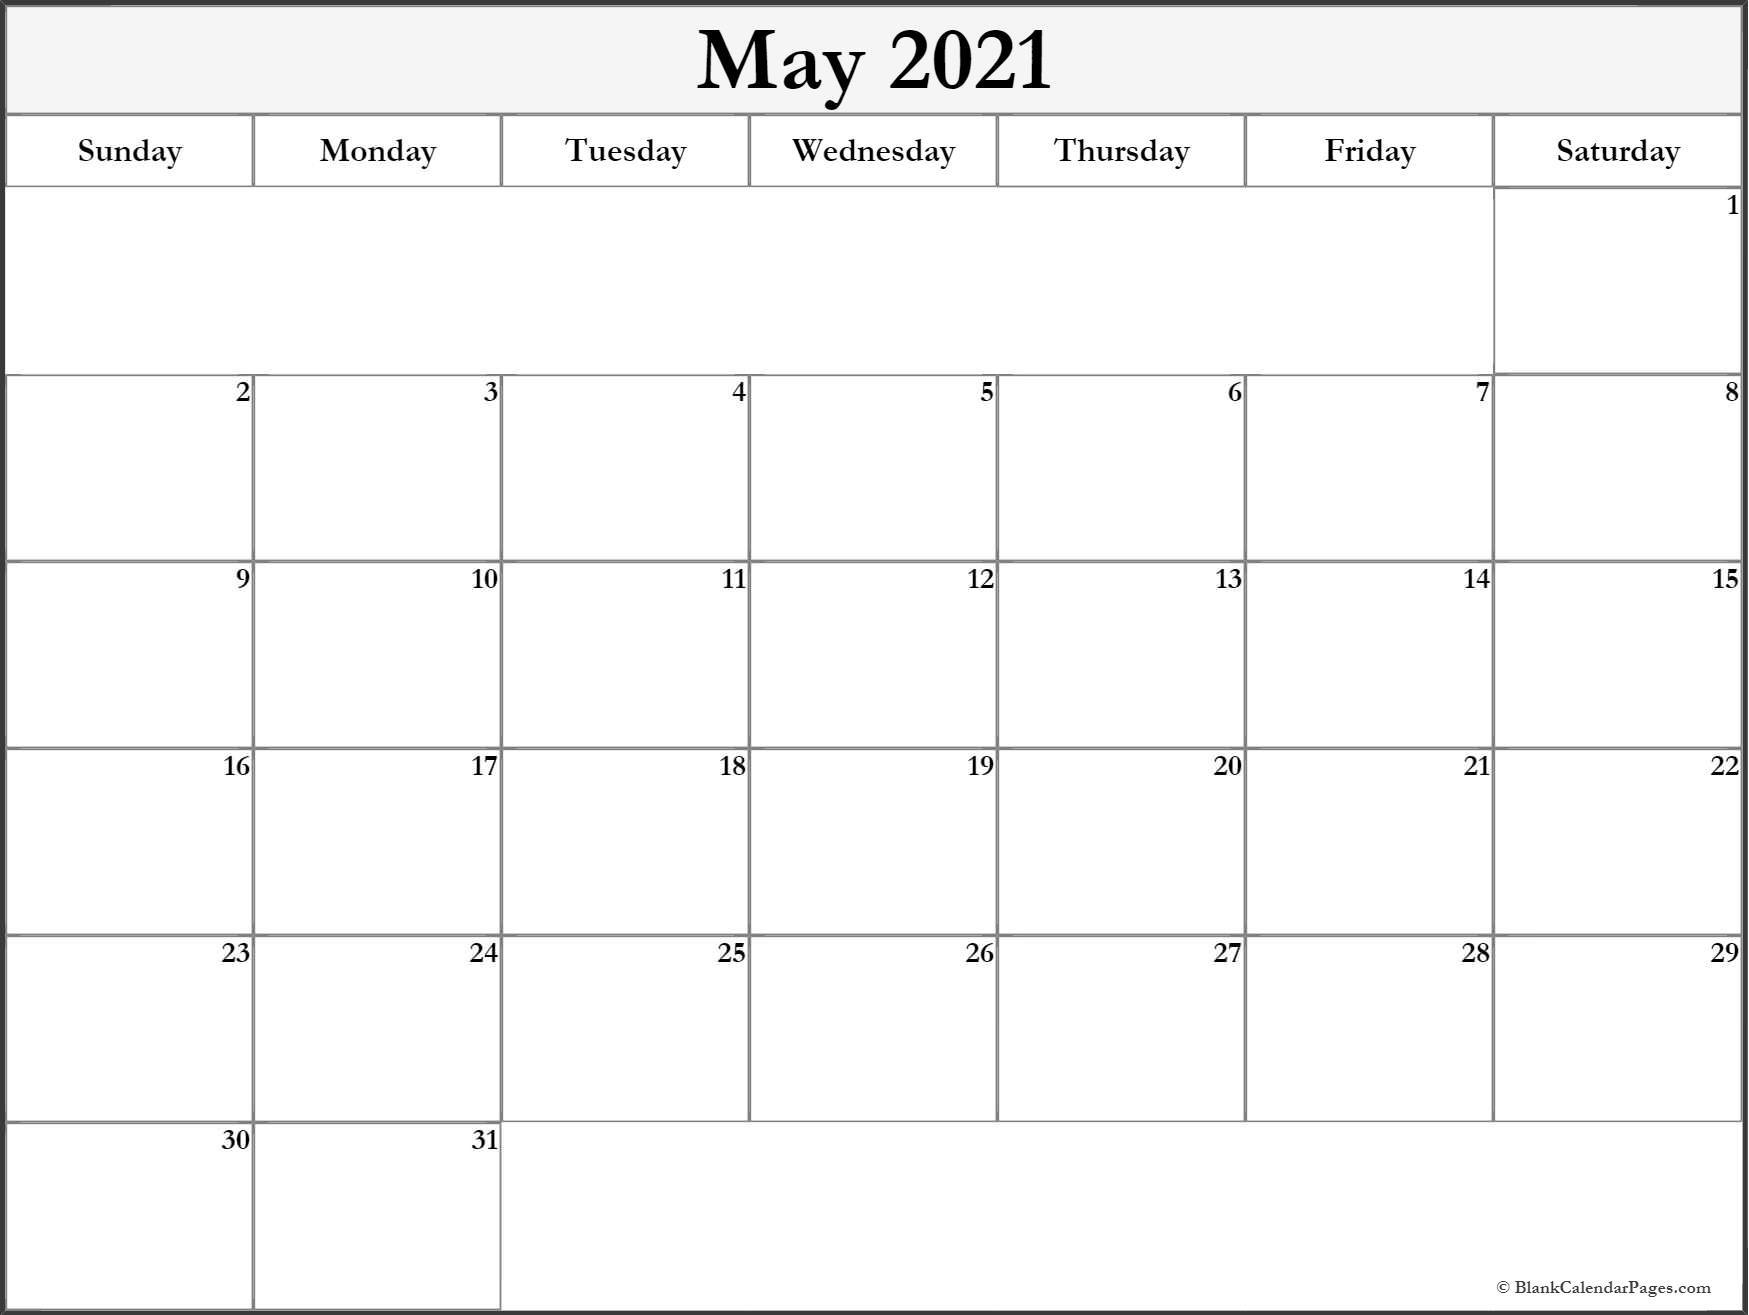 Blank May 2021 Calendar - Calendar 2020